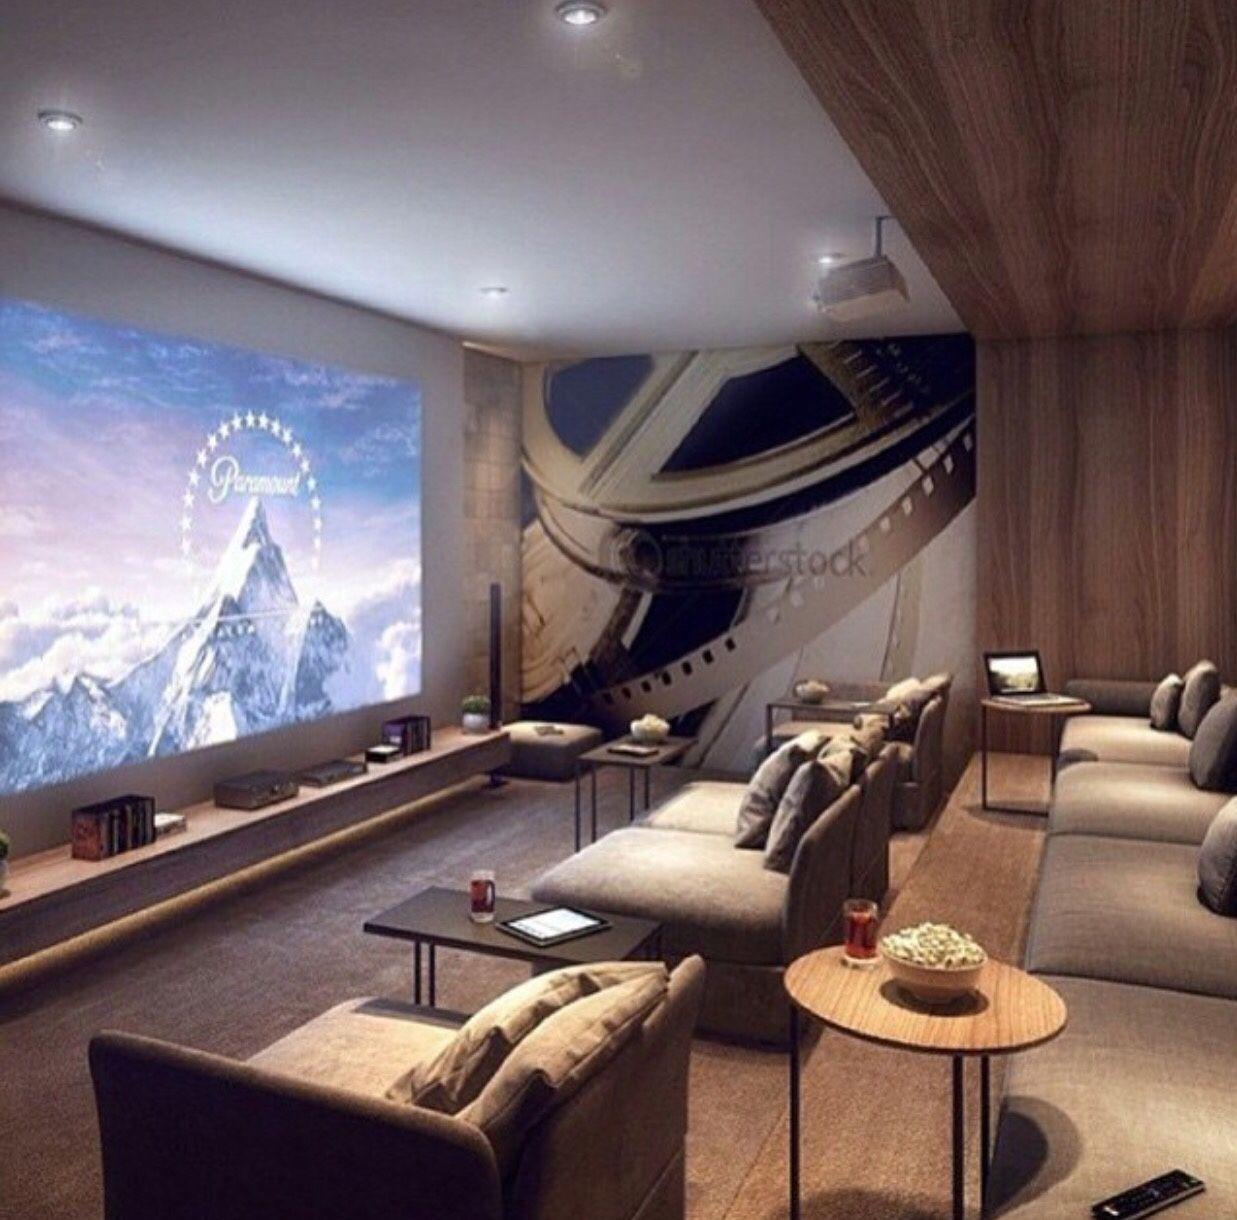 Home Theater Design Ideas Diy: Big Dreams & Luxury Taste